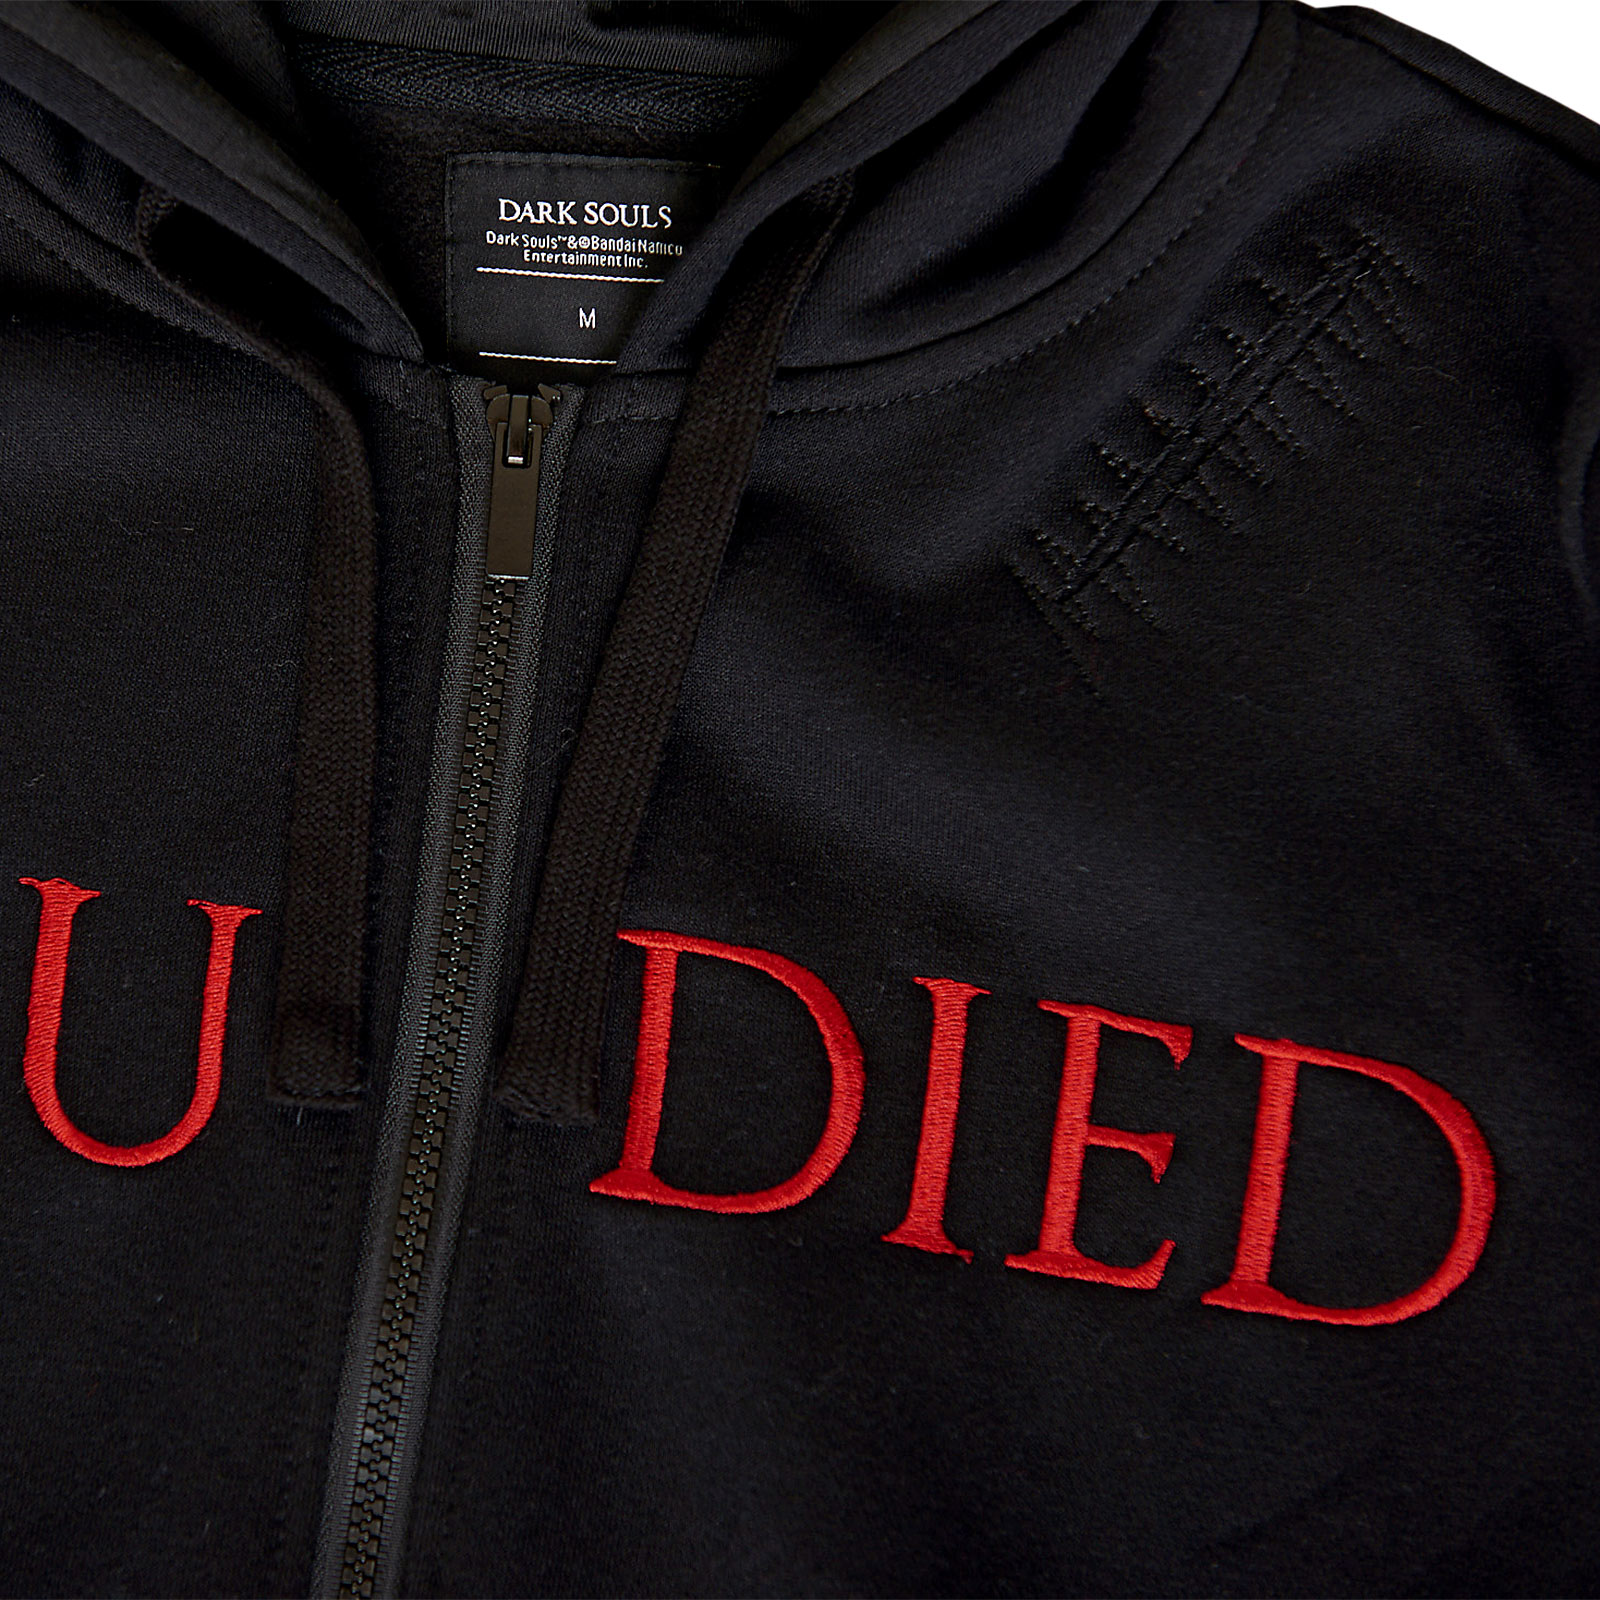 Dark Souls - You Died Destroyed Kapuzenjacke schwarz